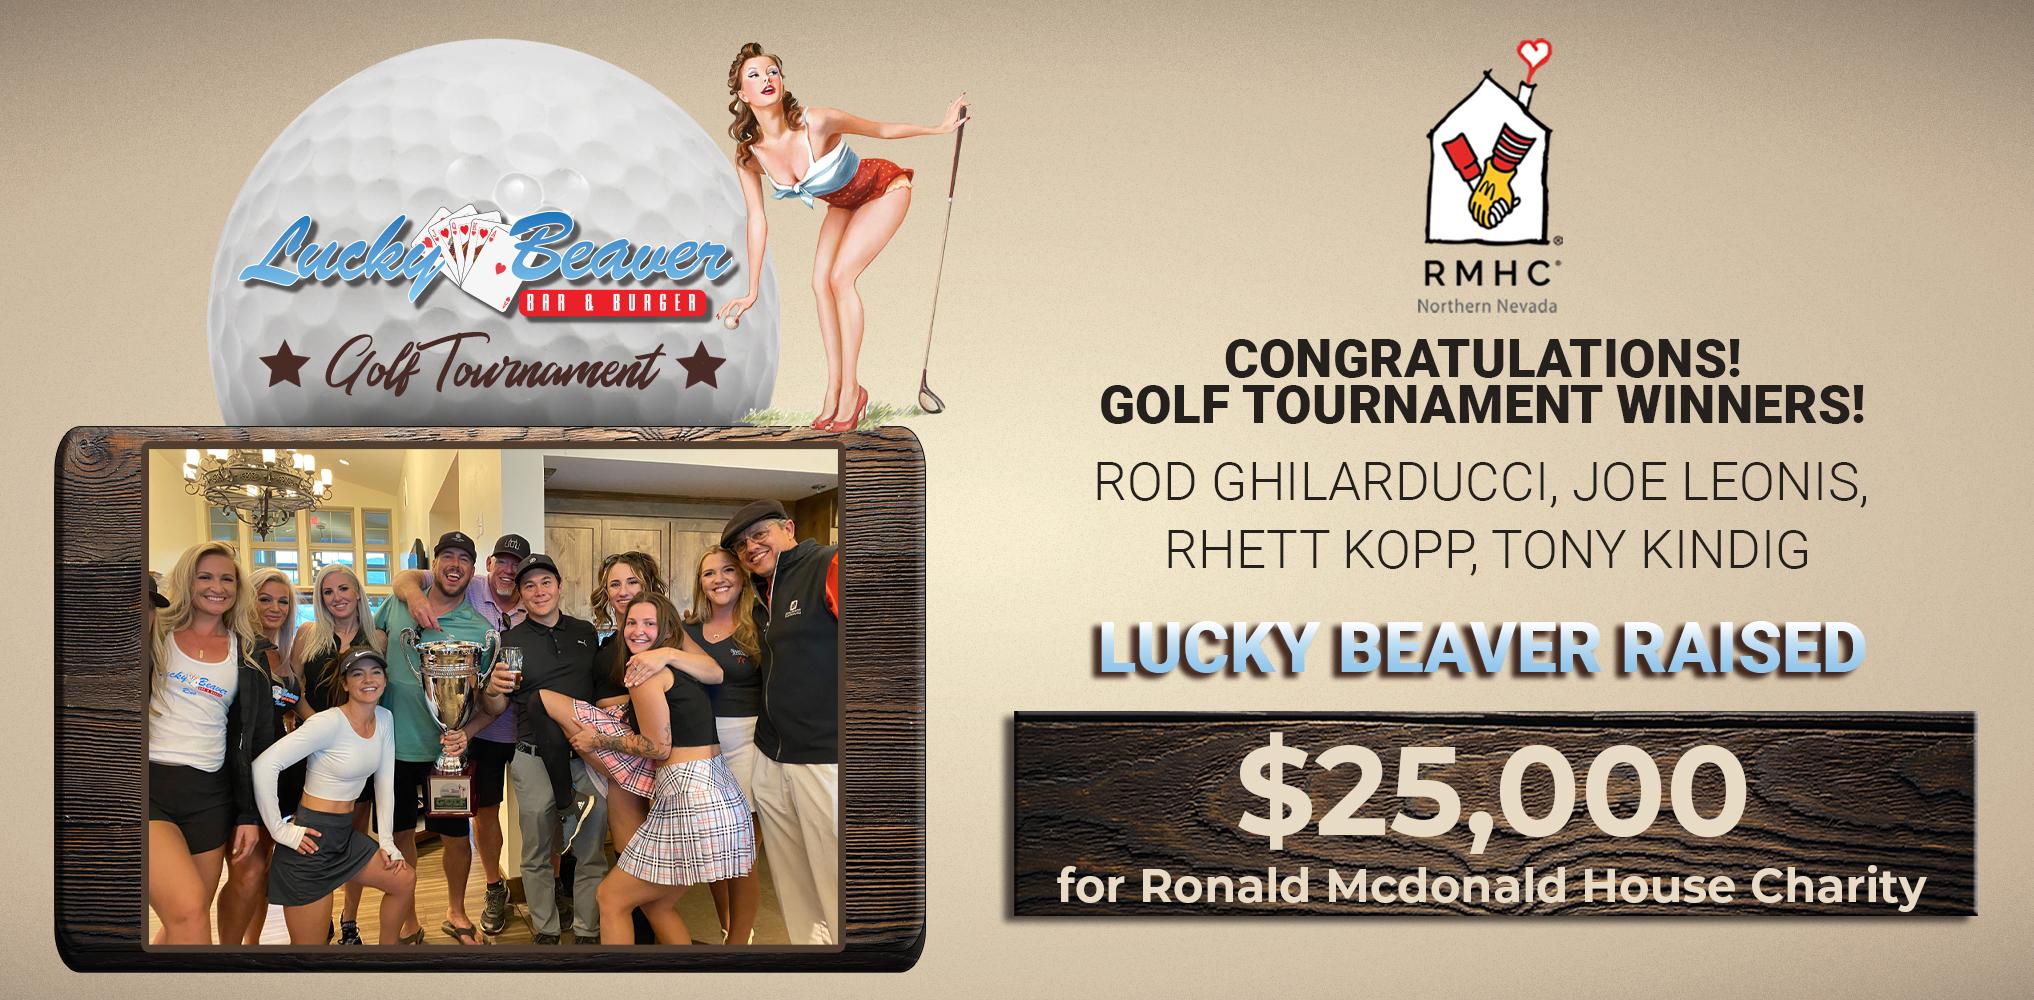 Congratulations Golf Tournament Winners!  Lucky Beaver Raised $25k for Ronald McDonald House Charity